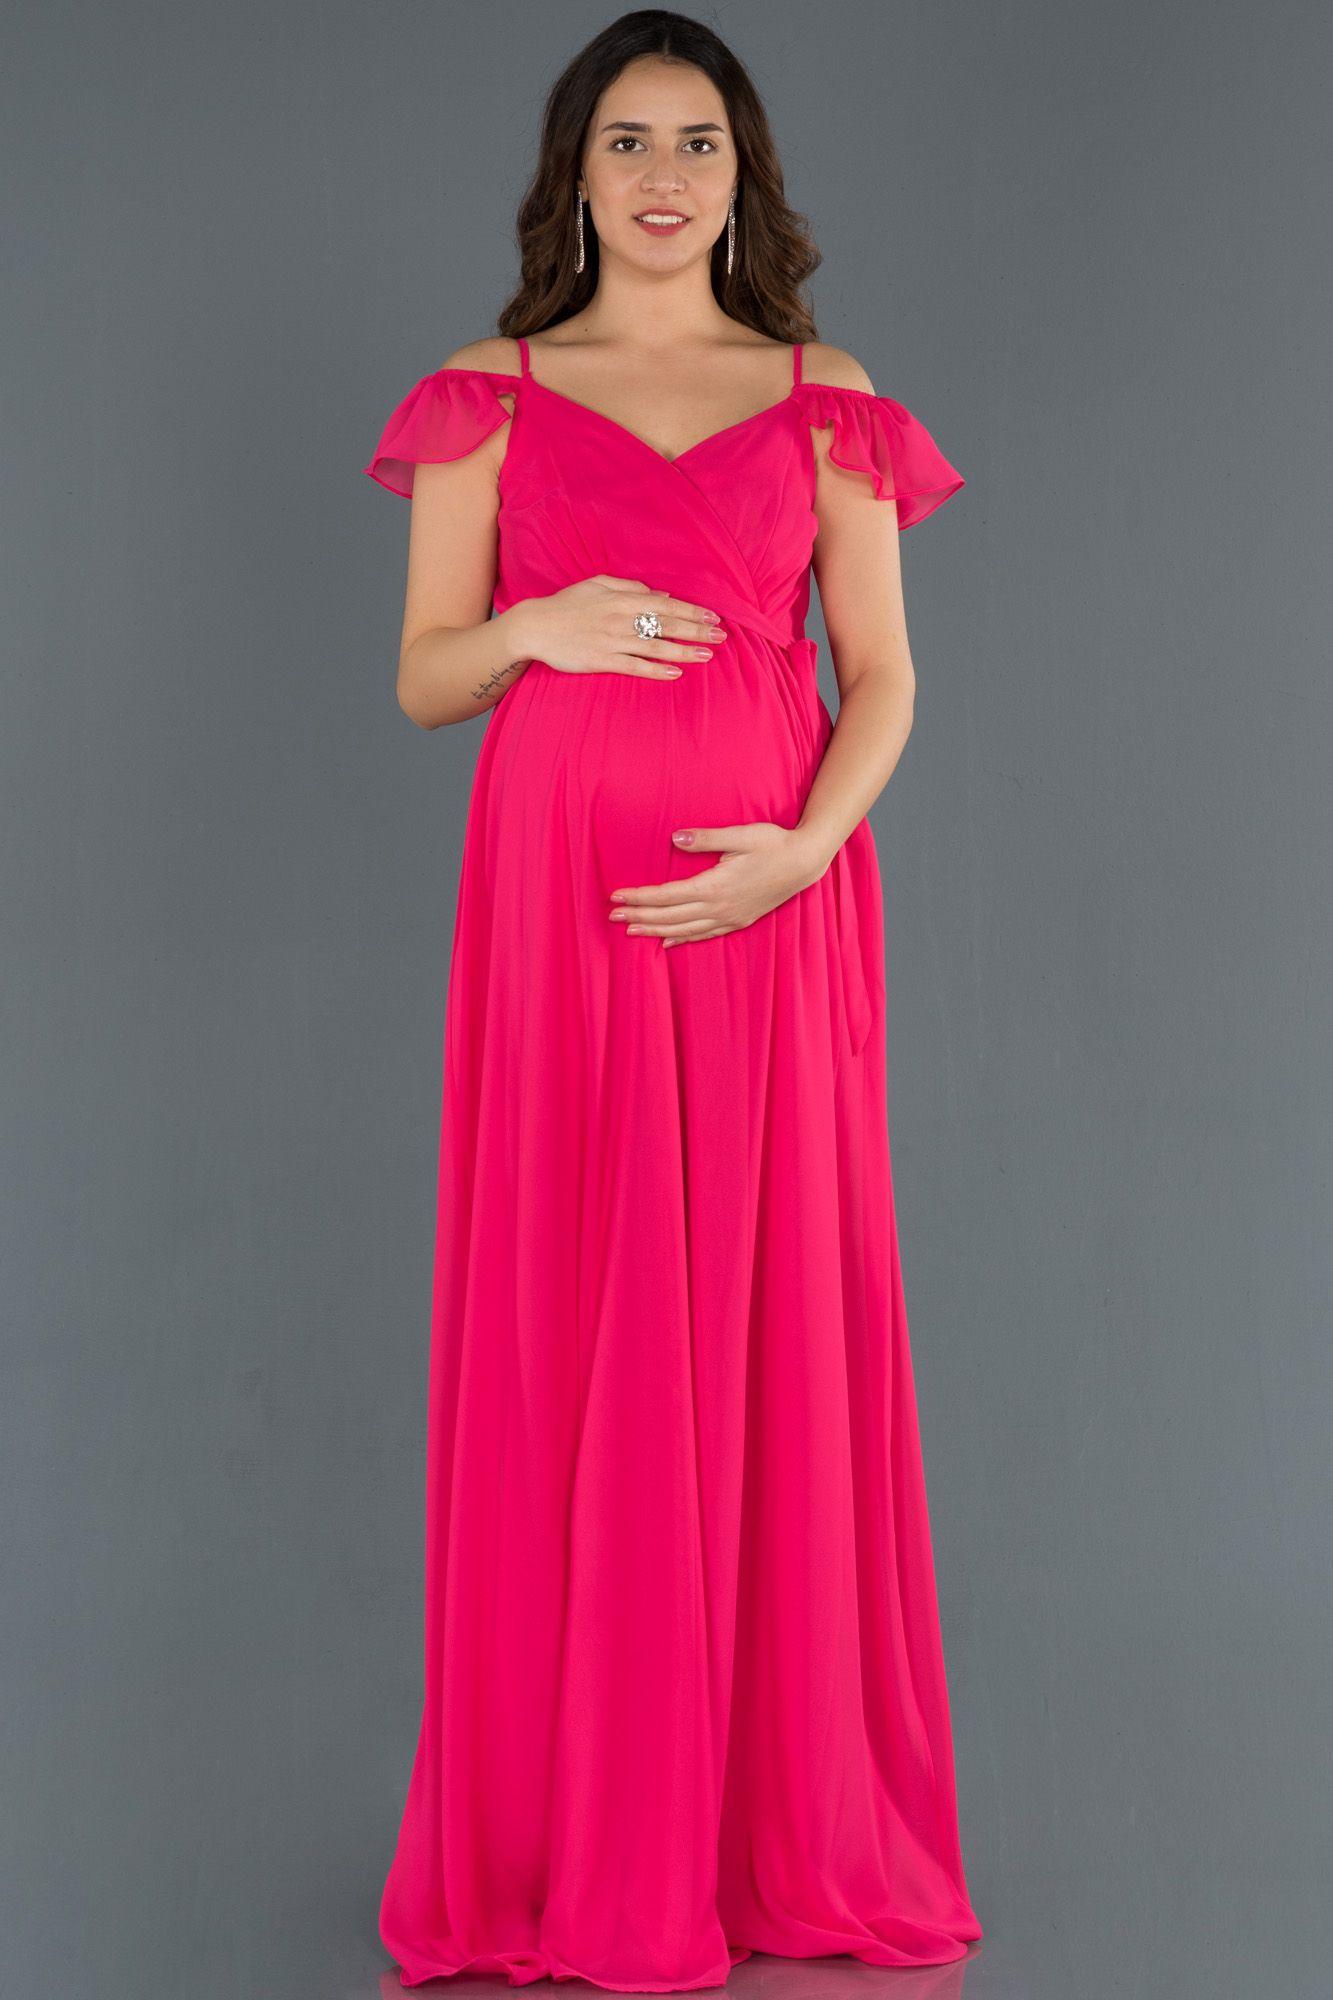 Kan Portakali Kollari Volanli Hamile Abiye Abu756 2020 Elbise Modelleri Elbise The Dress